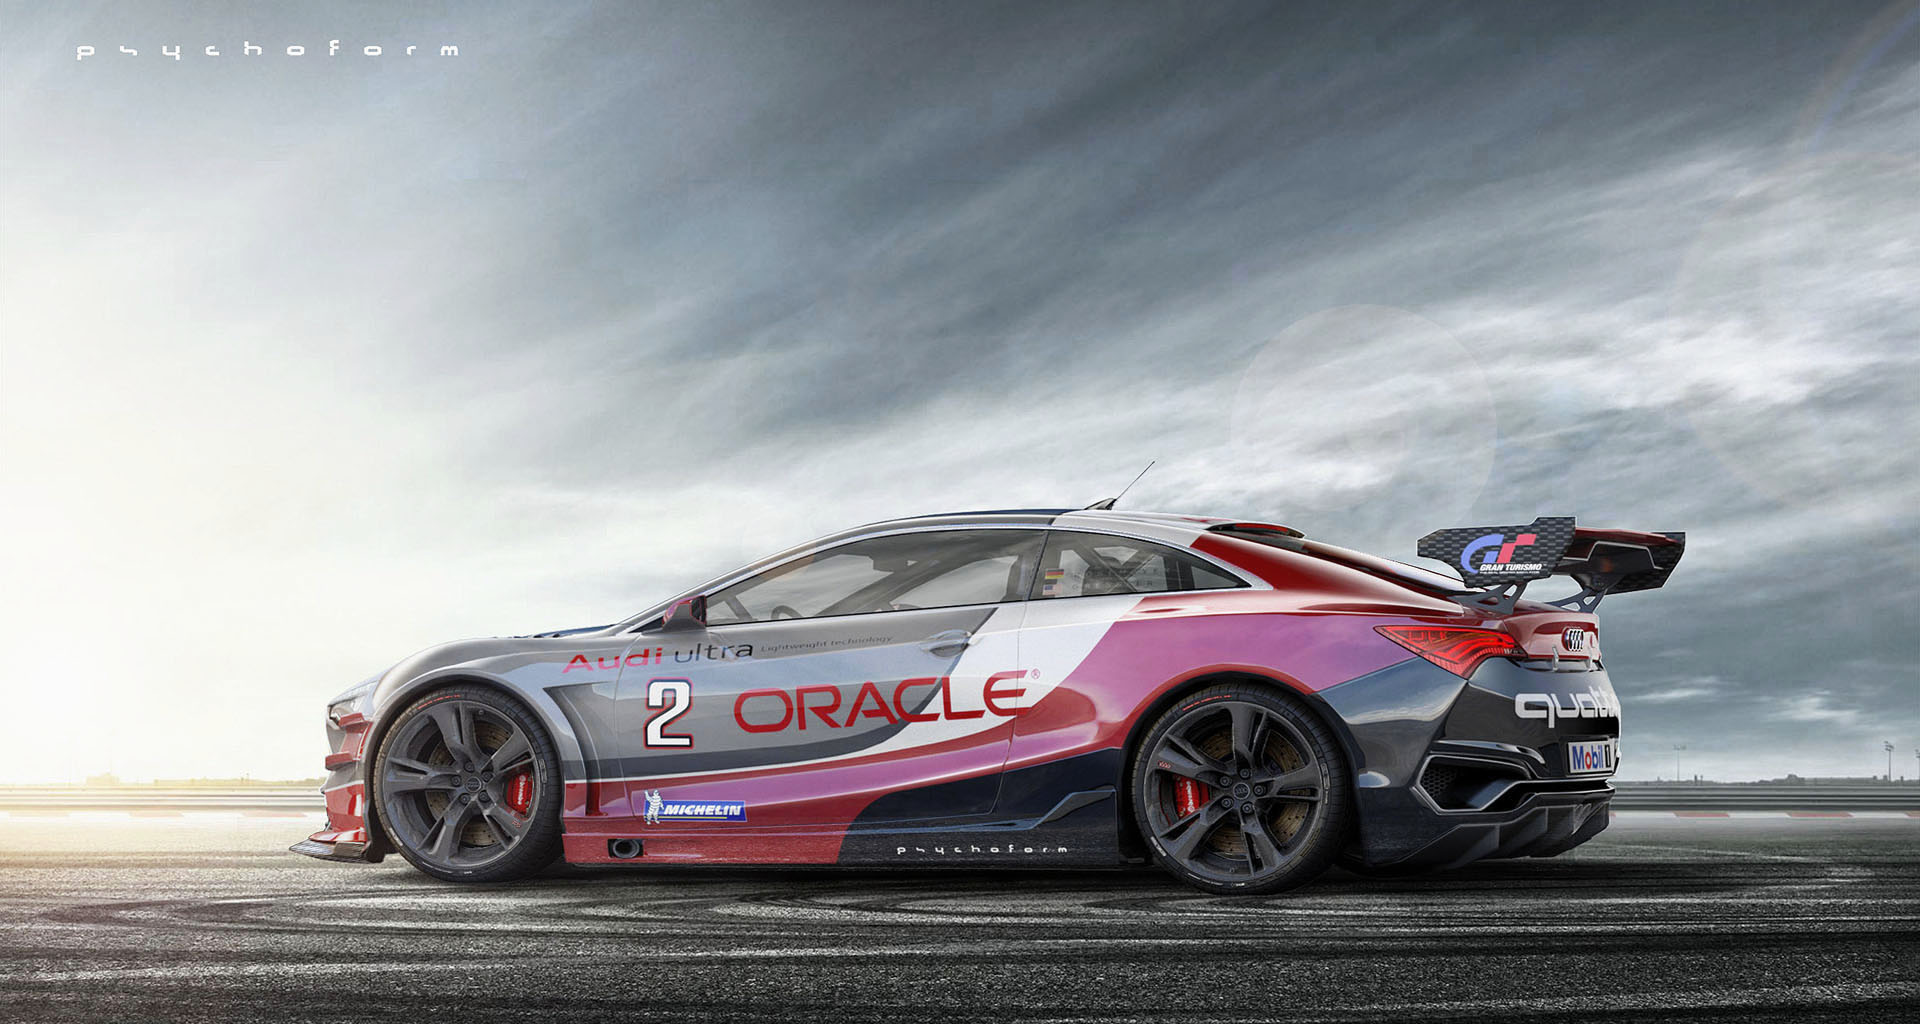 Powering the Lexus LF-LC concept is a orf sport + mit der live-übertragung vom bet-at-home cup  hybrid drivetrain.